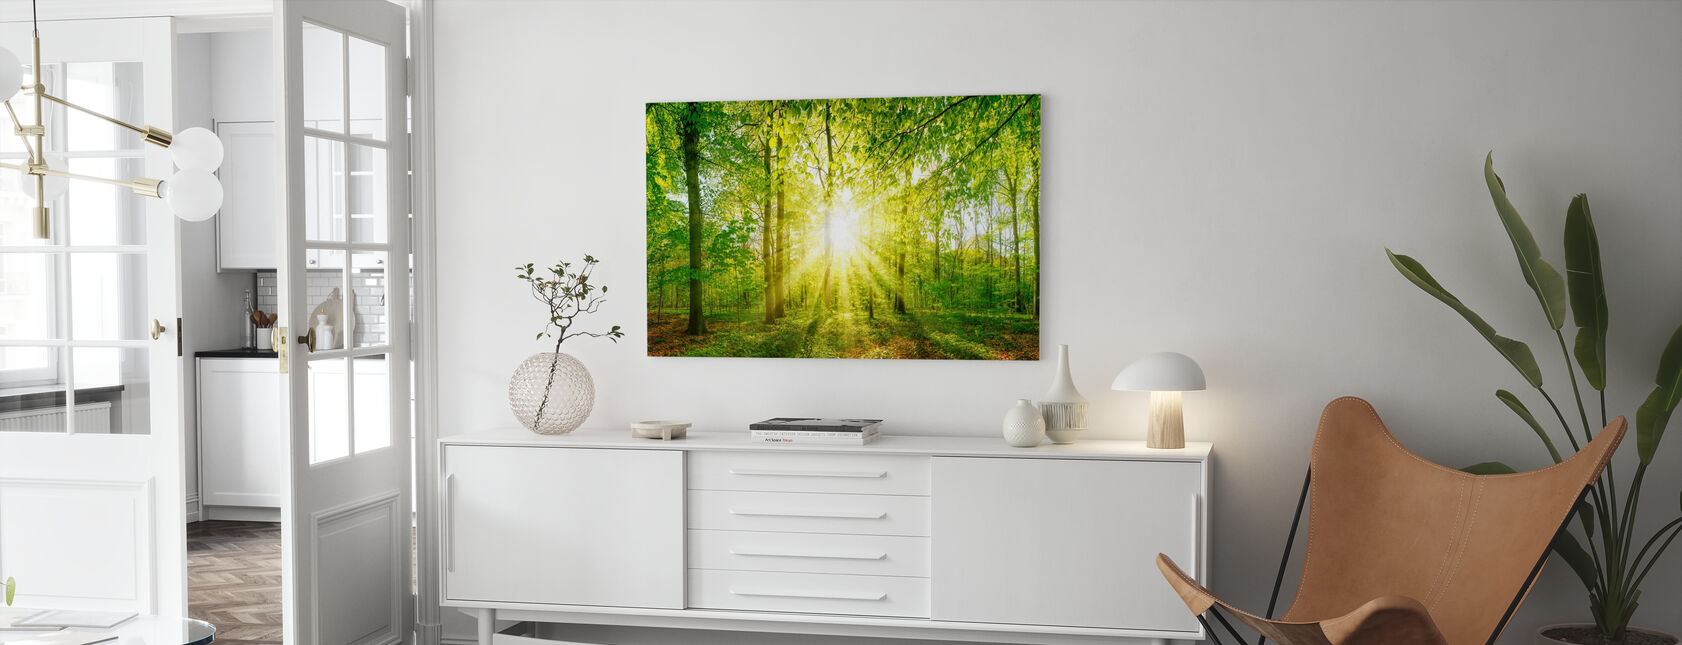 Sonnenuntergang Wald - Leinwandbild - Wohnzimmer